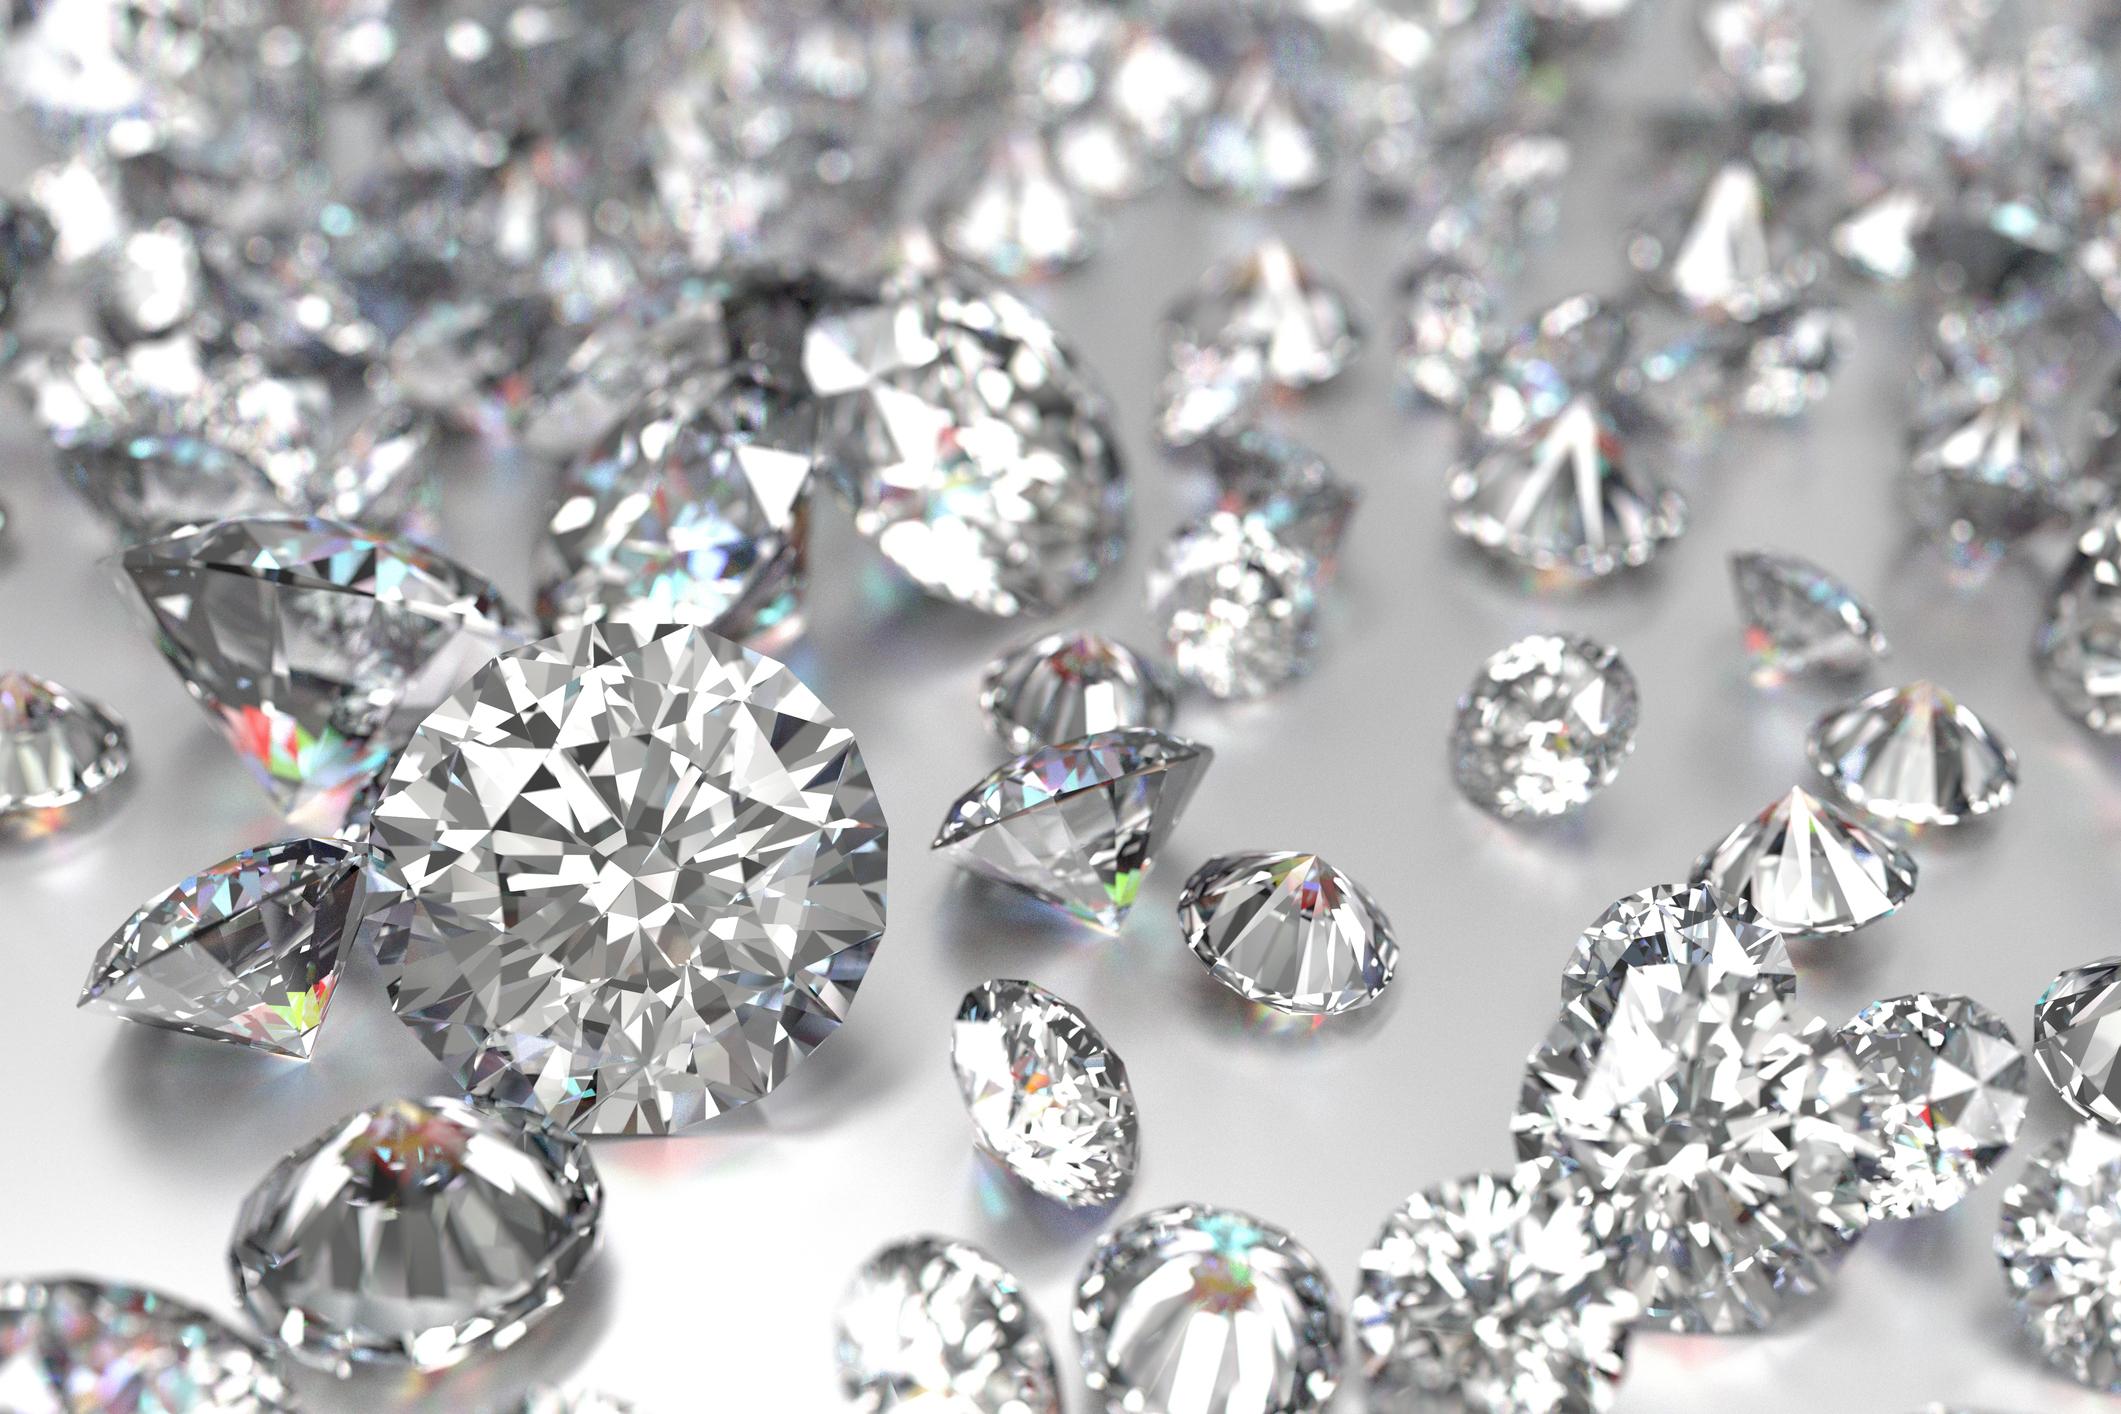 A large pile of diamonds.